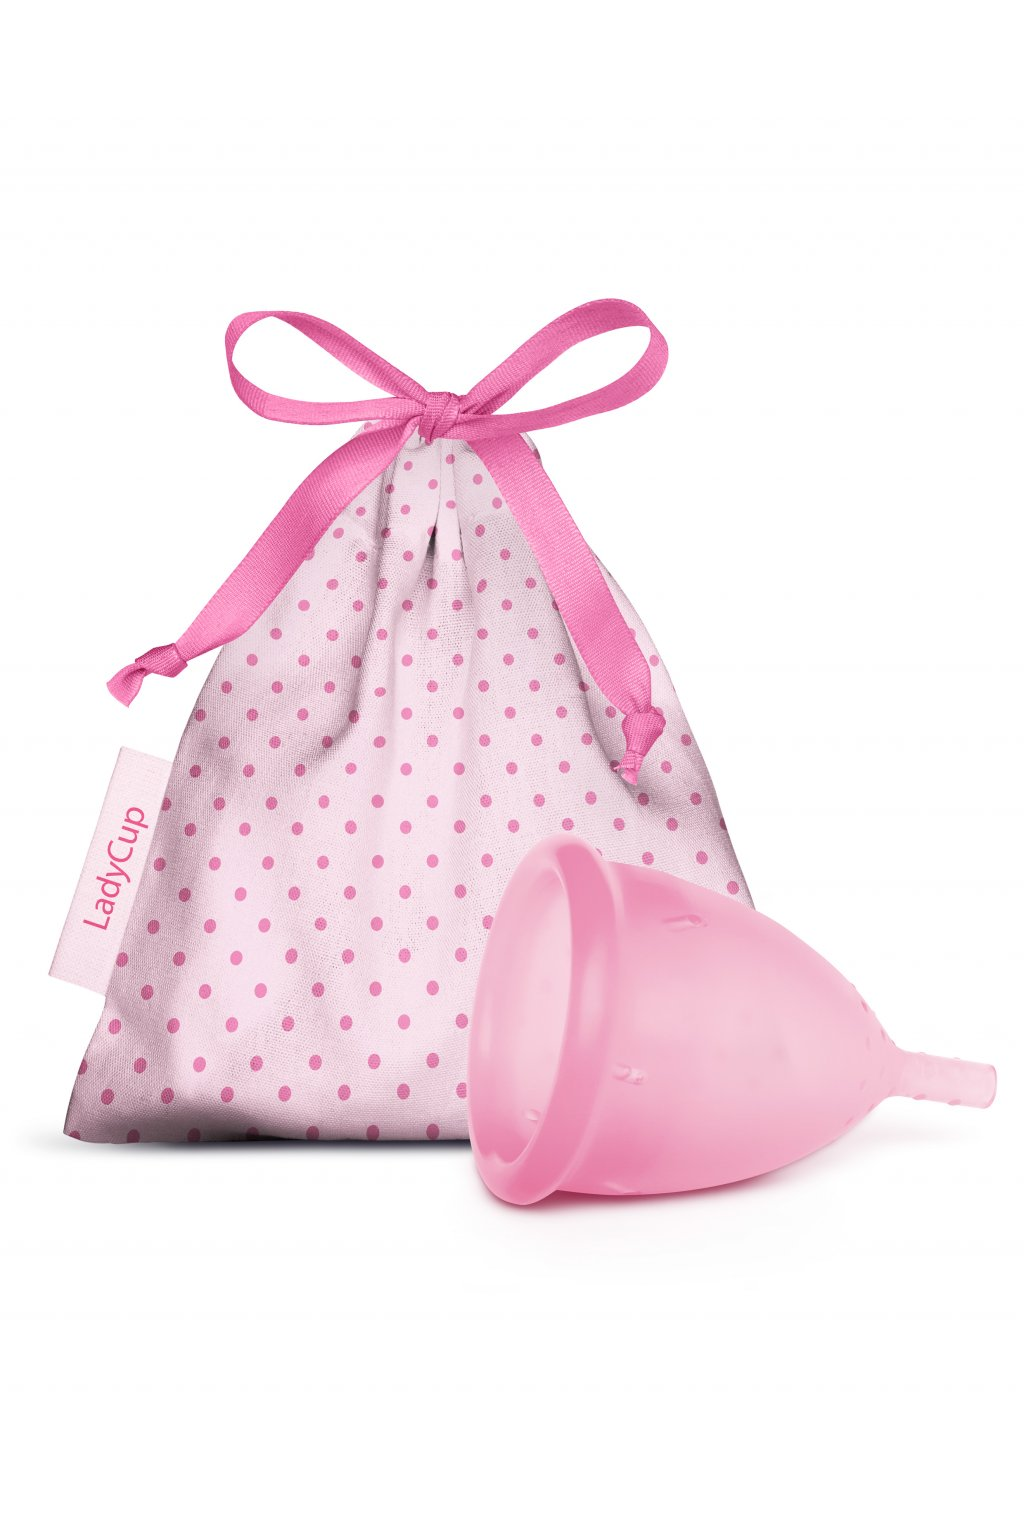 03 LadyCup Pink